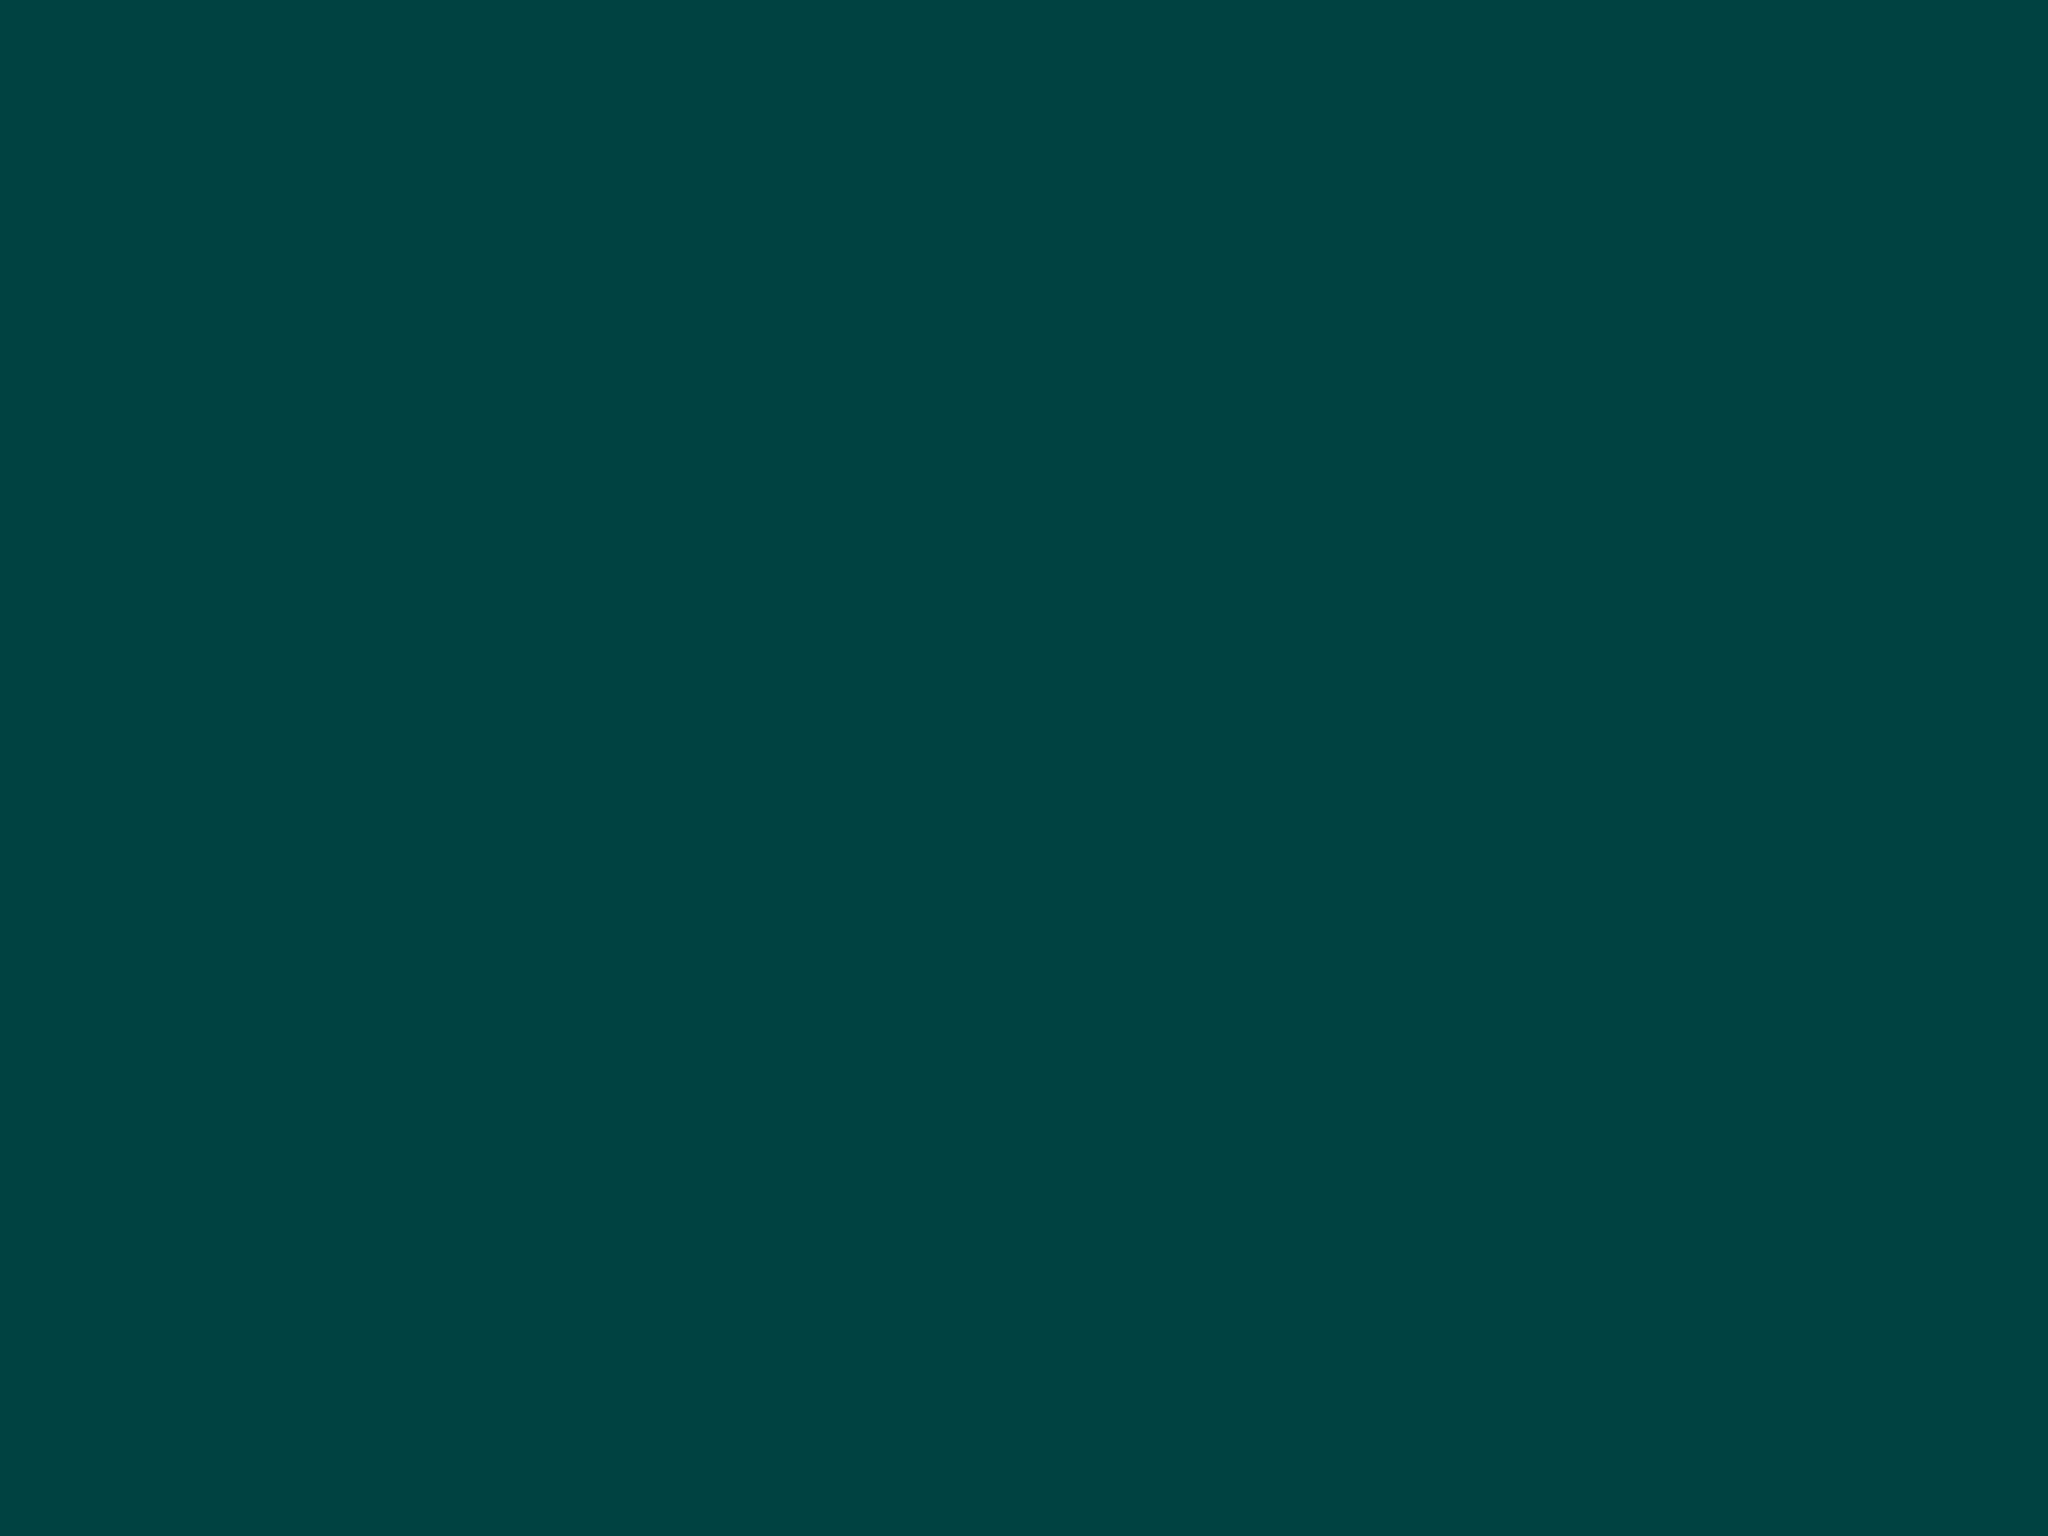 2048x1536 Warm Black Solid Color Background